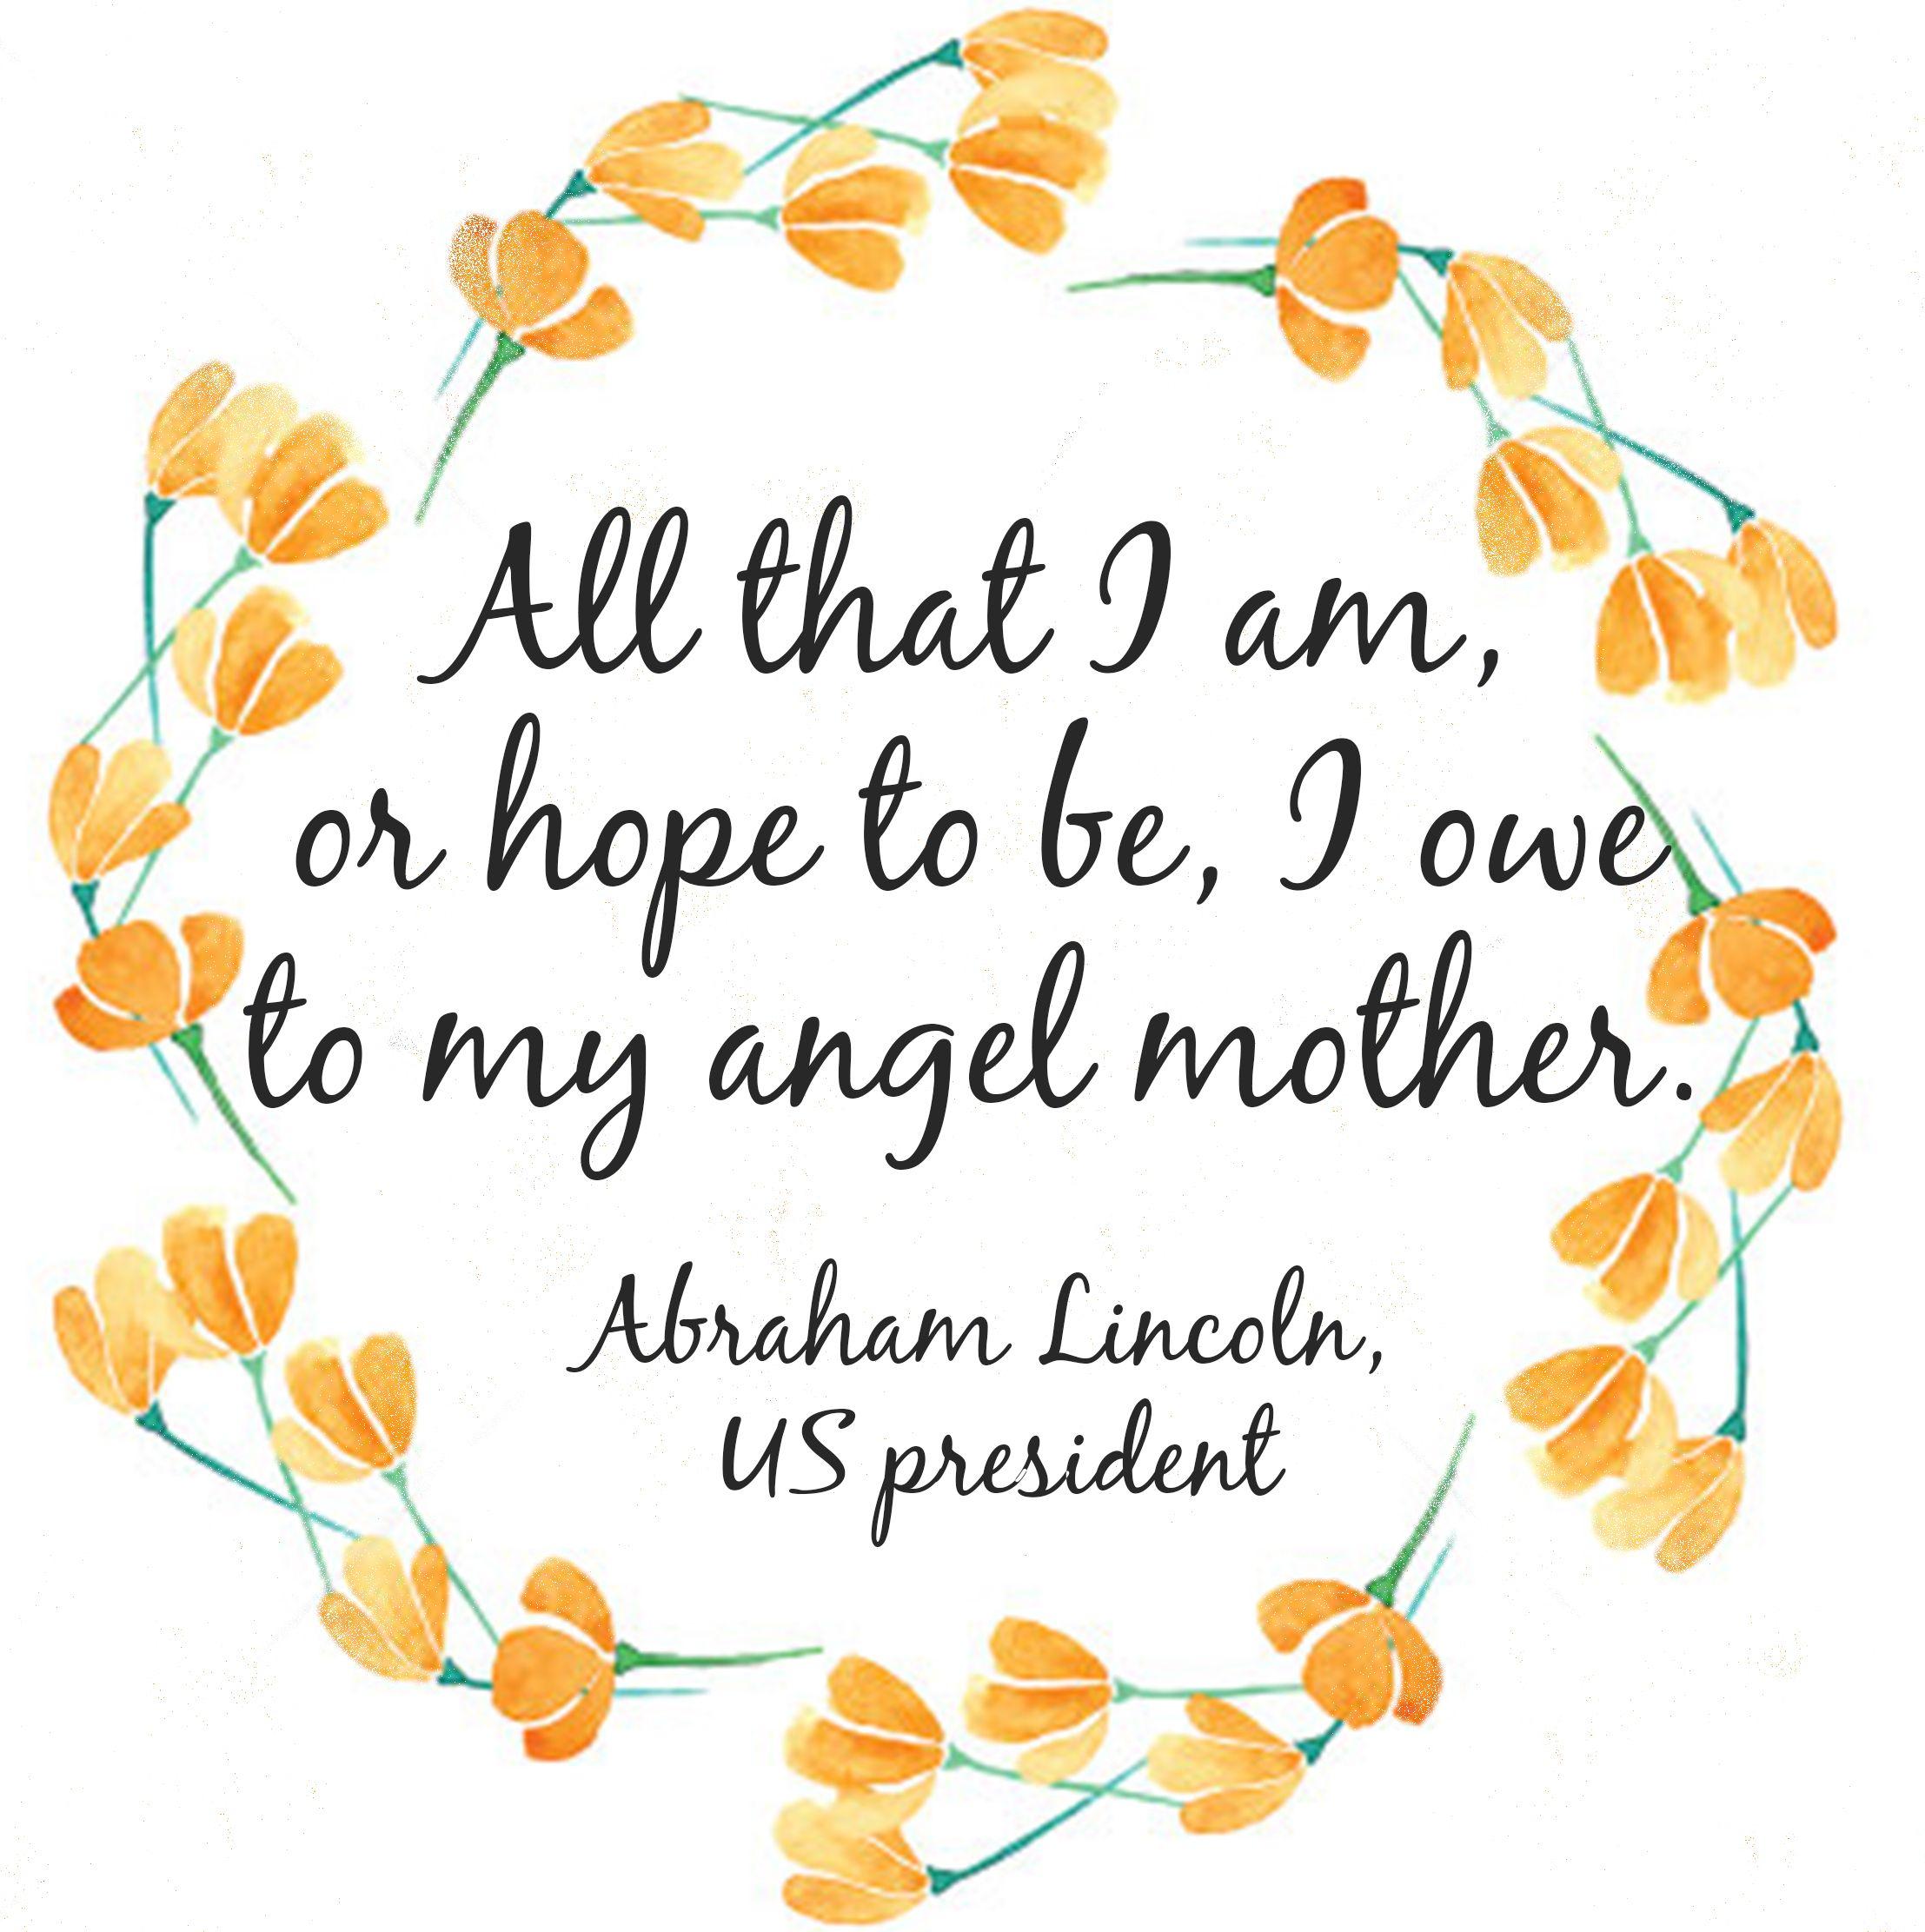 All That I Am Or Hope To Be I Owe To My Angel Mother Abraham